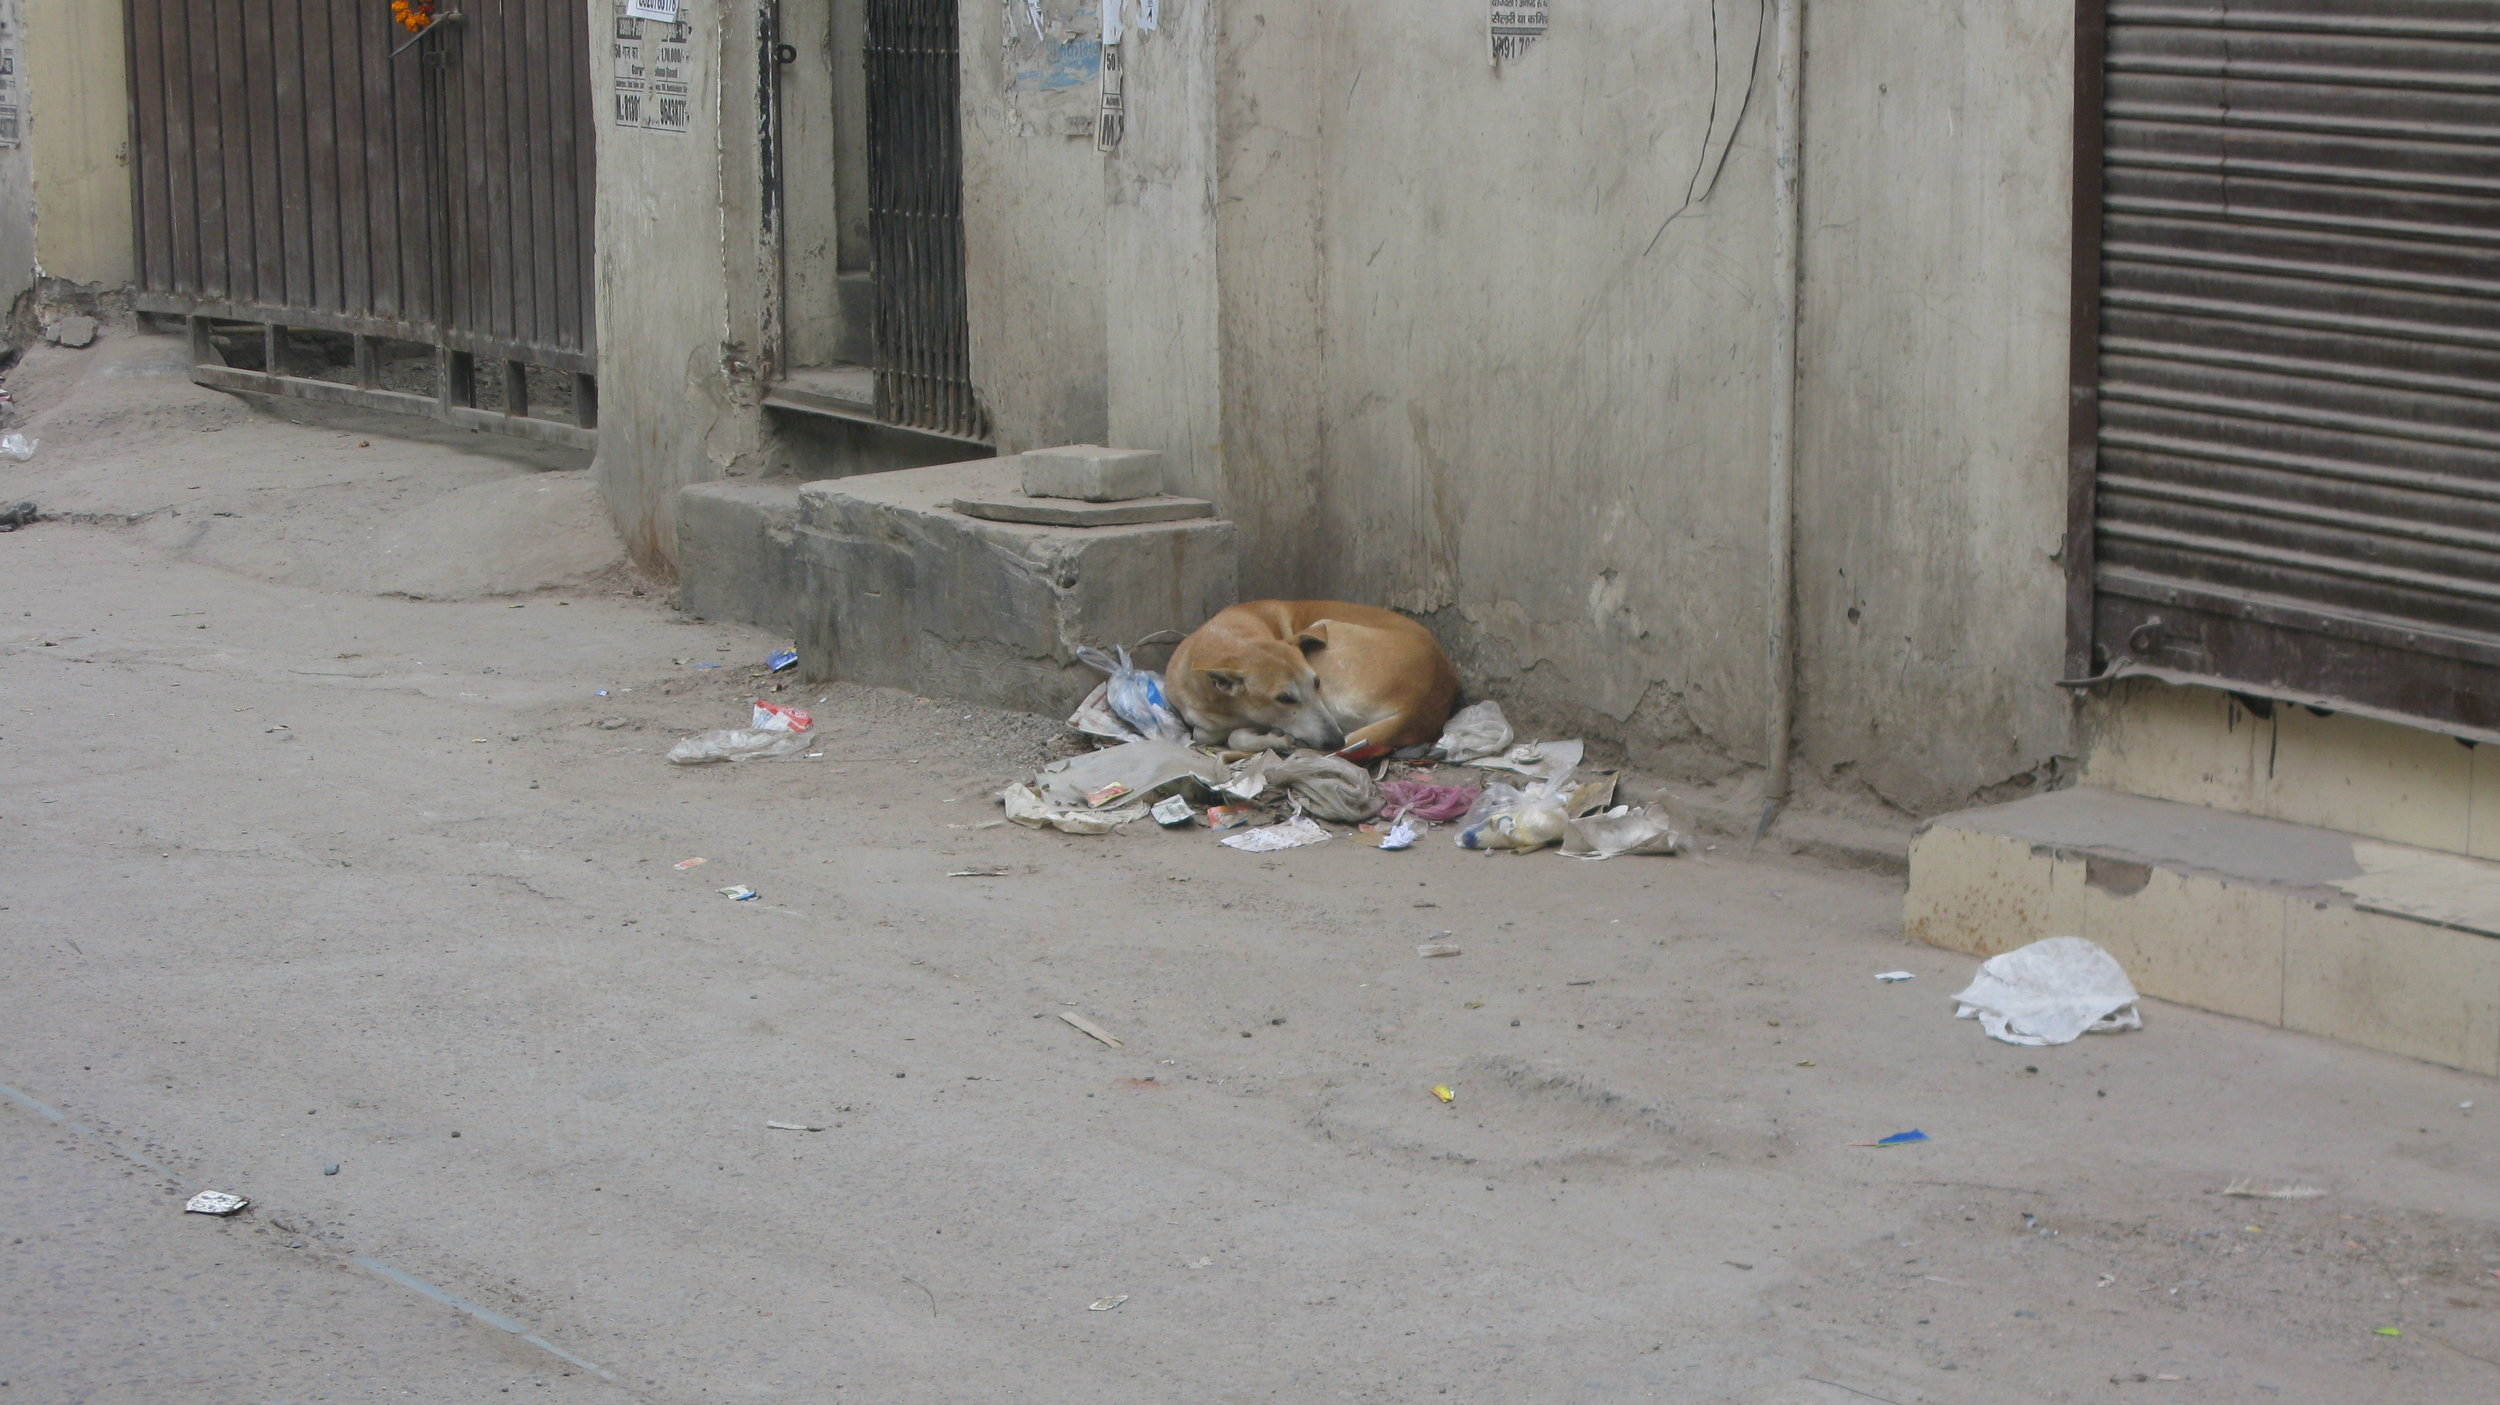 Street Dog Garbage - F*ck Plastic